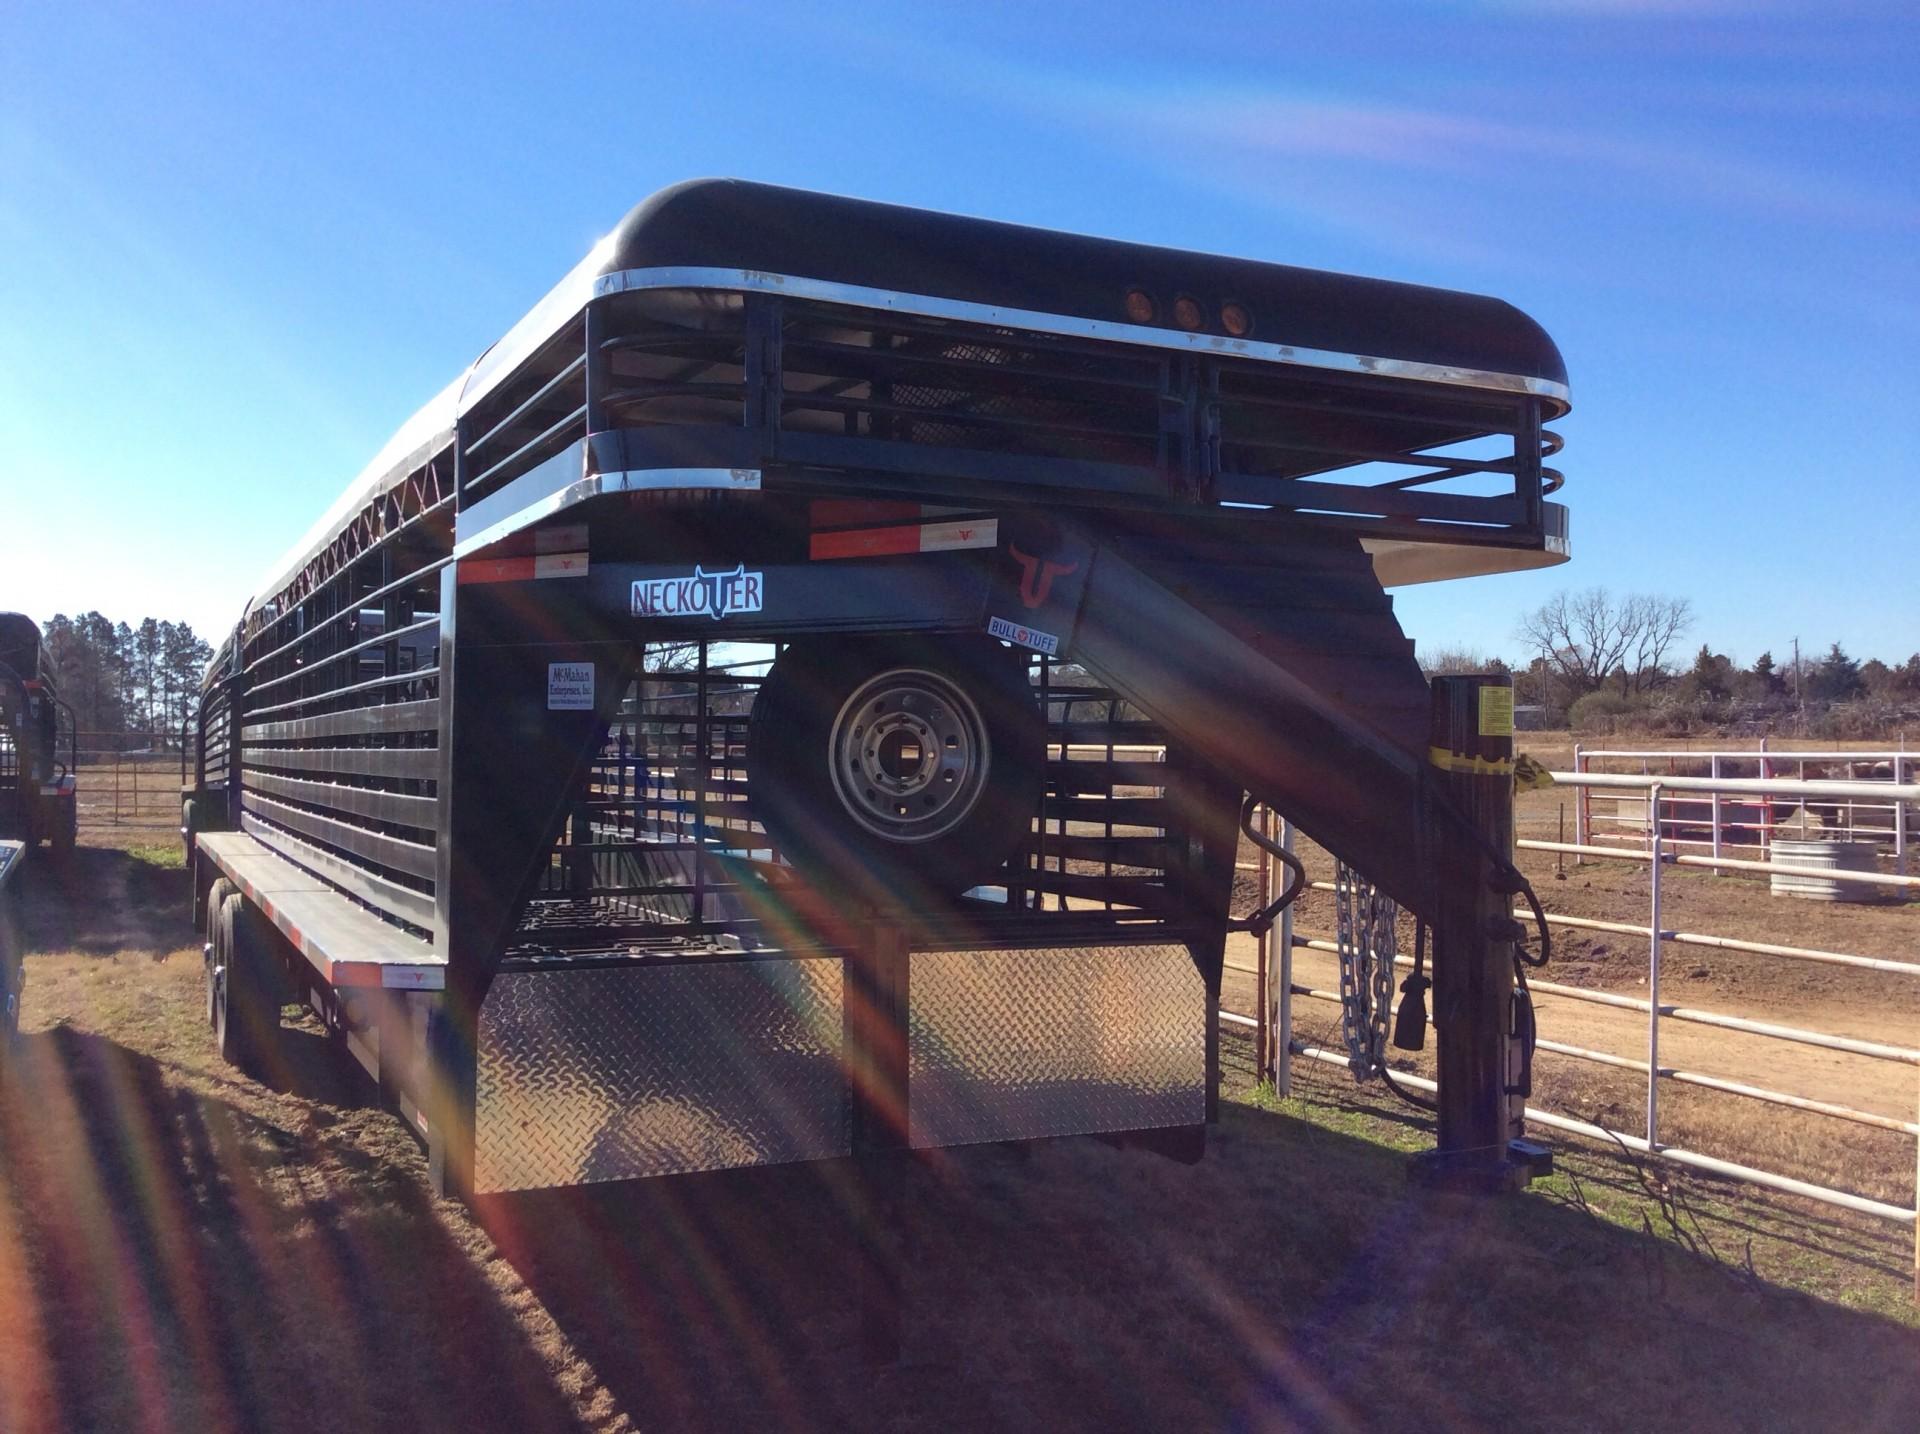 2016 Neckover 24x6.8 dog nose stock trailer